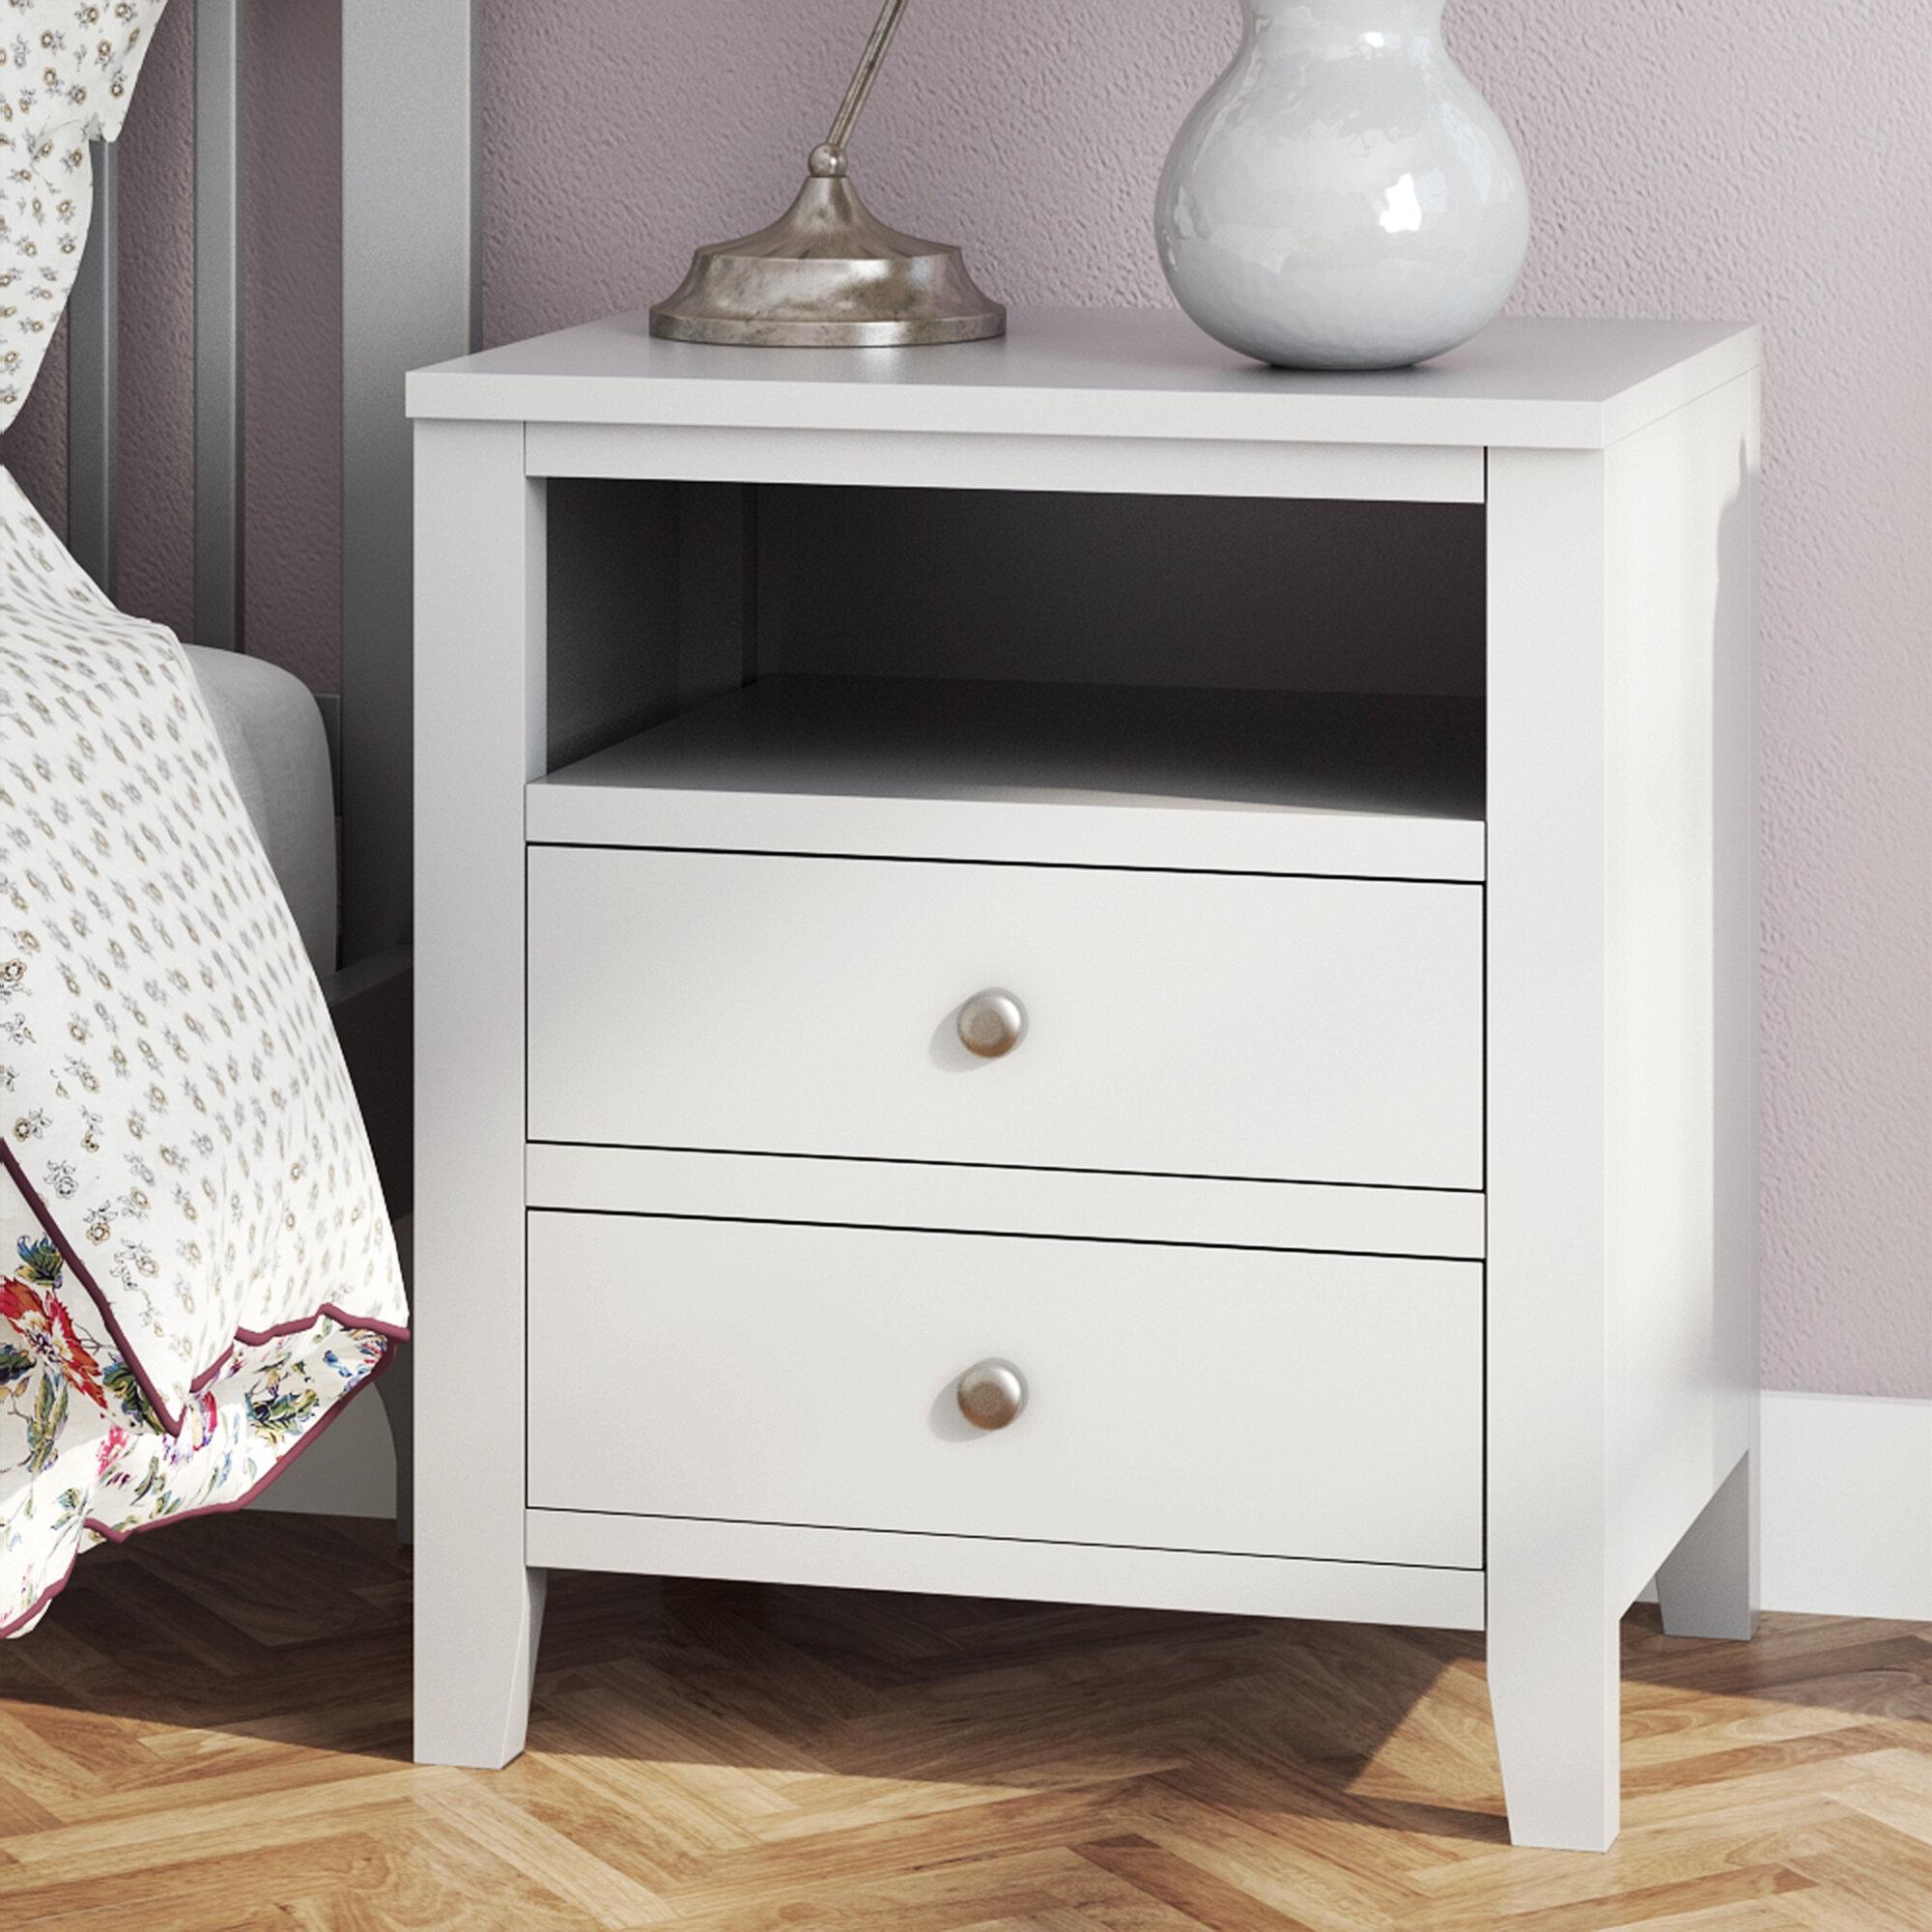 Fairmont Park Kingsbridge 2 Drawer Bedside Table Reviews Wayfair Co Uk